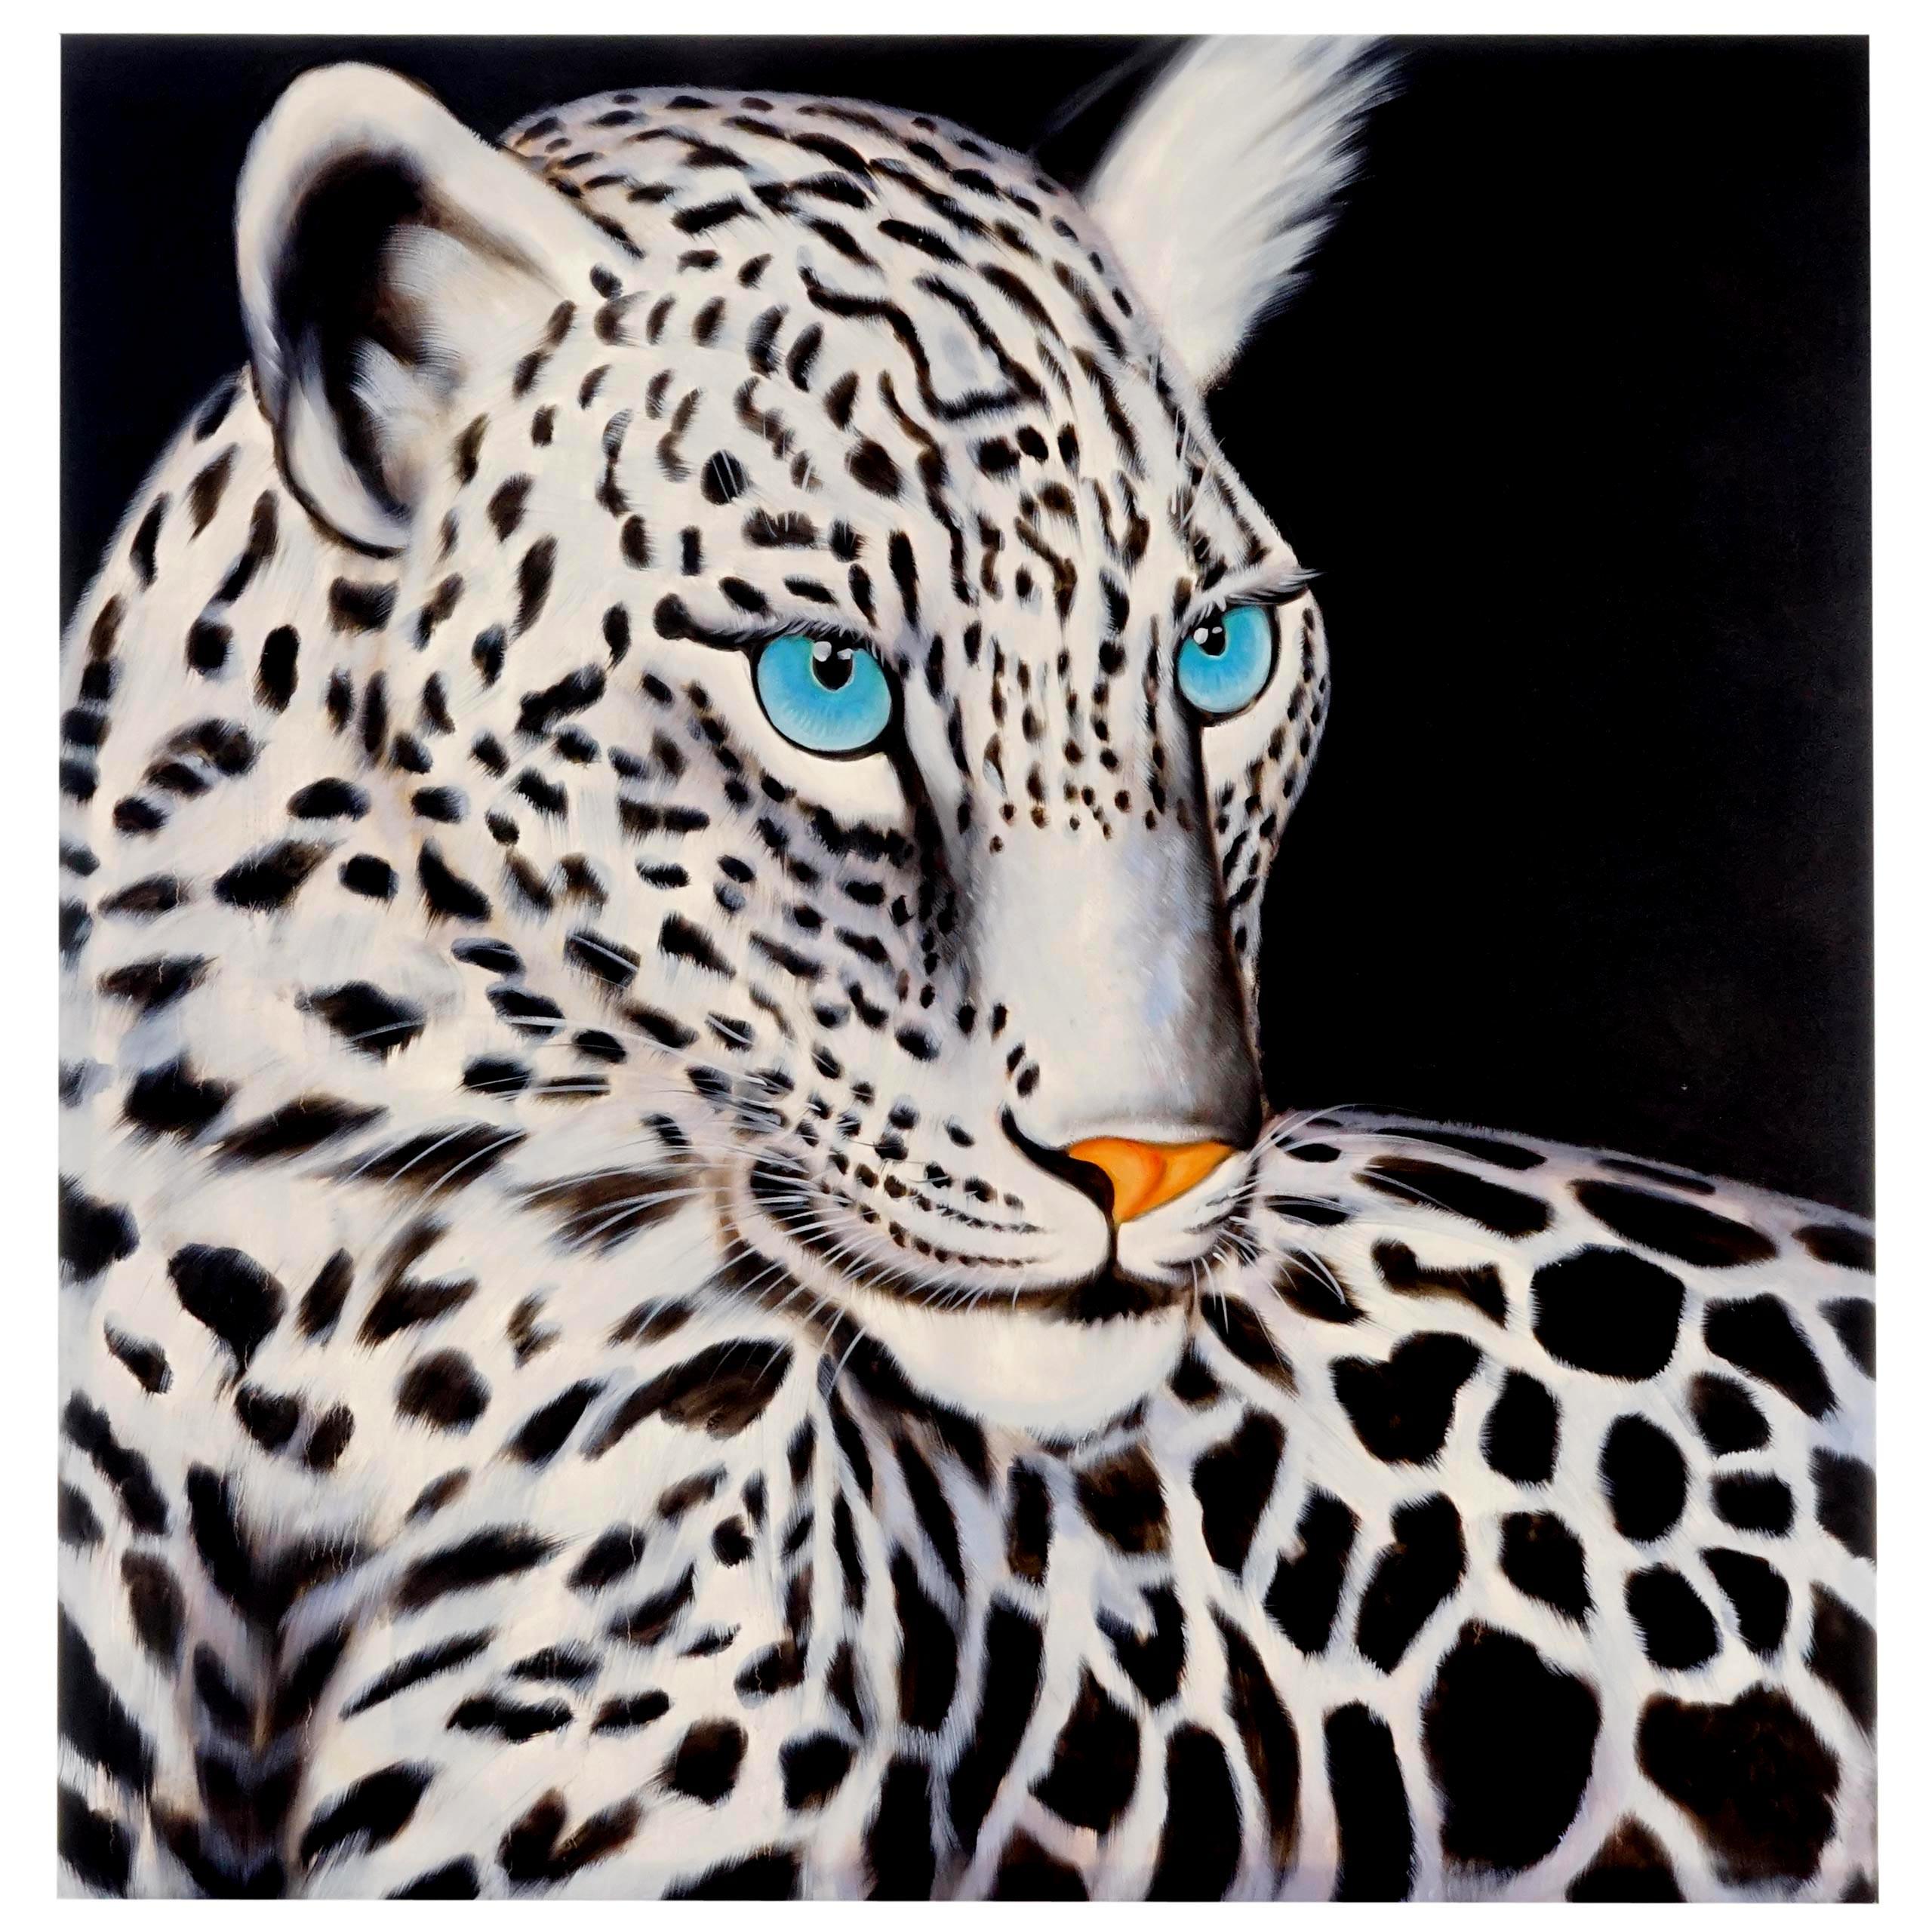 Mendler Wandbild Weißer Leopard, 100% handgemaltes Ölgemälde Gemälde XL ~ Variantenangebot 44724